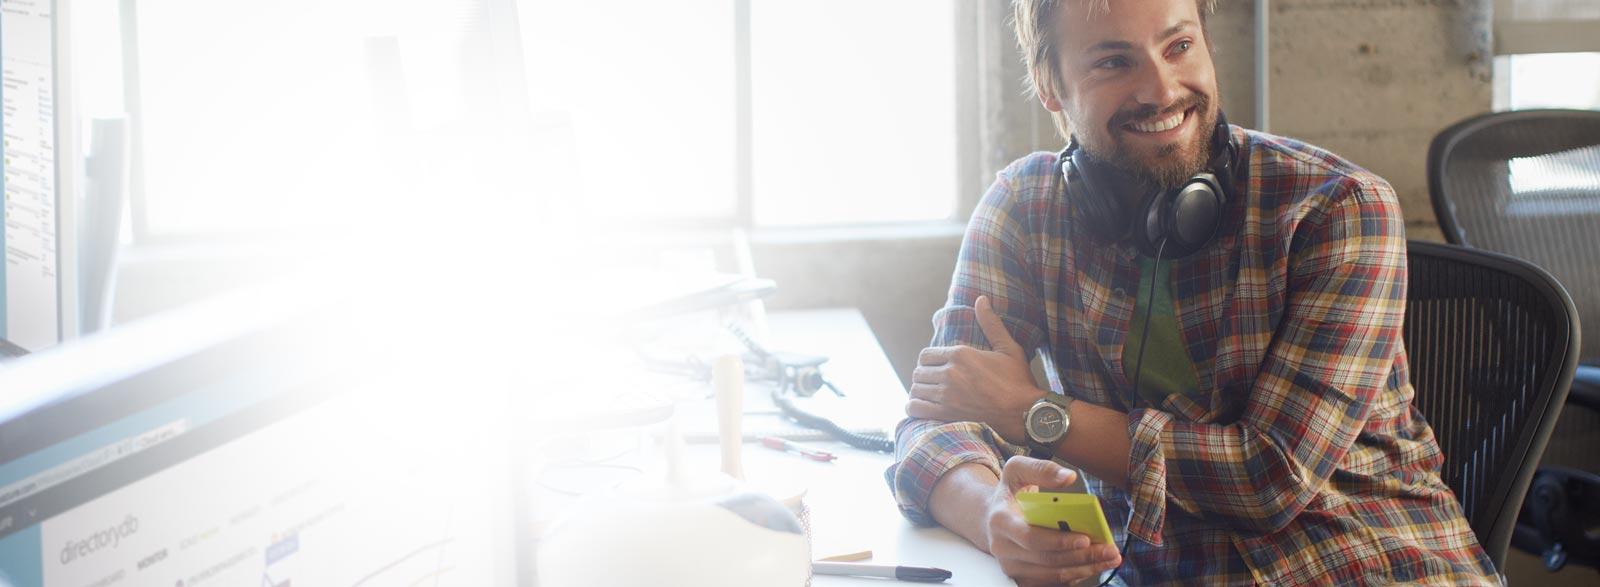 Office 365 Enterprise E1을 통해 최신 생산성 및 공동 작업 서비스를 사용해 보세요.